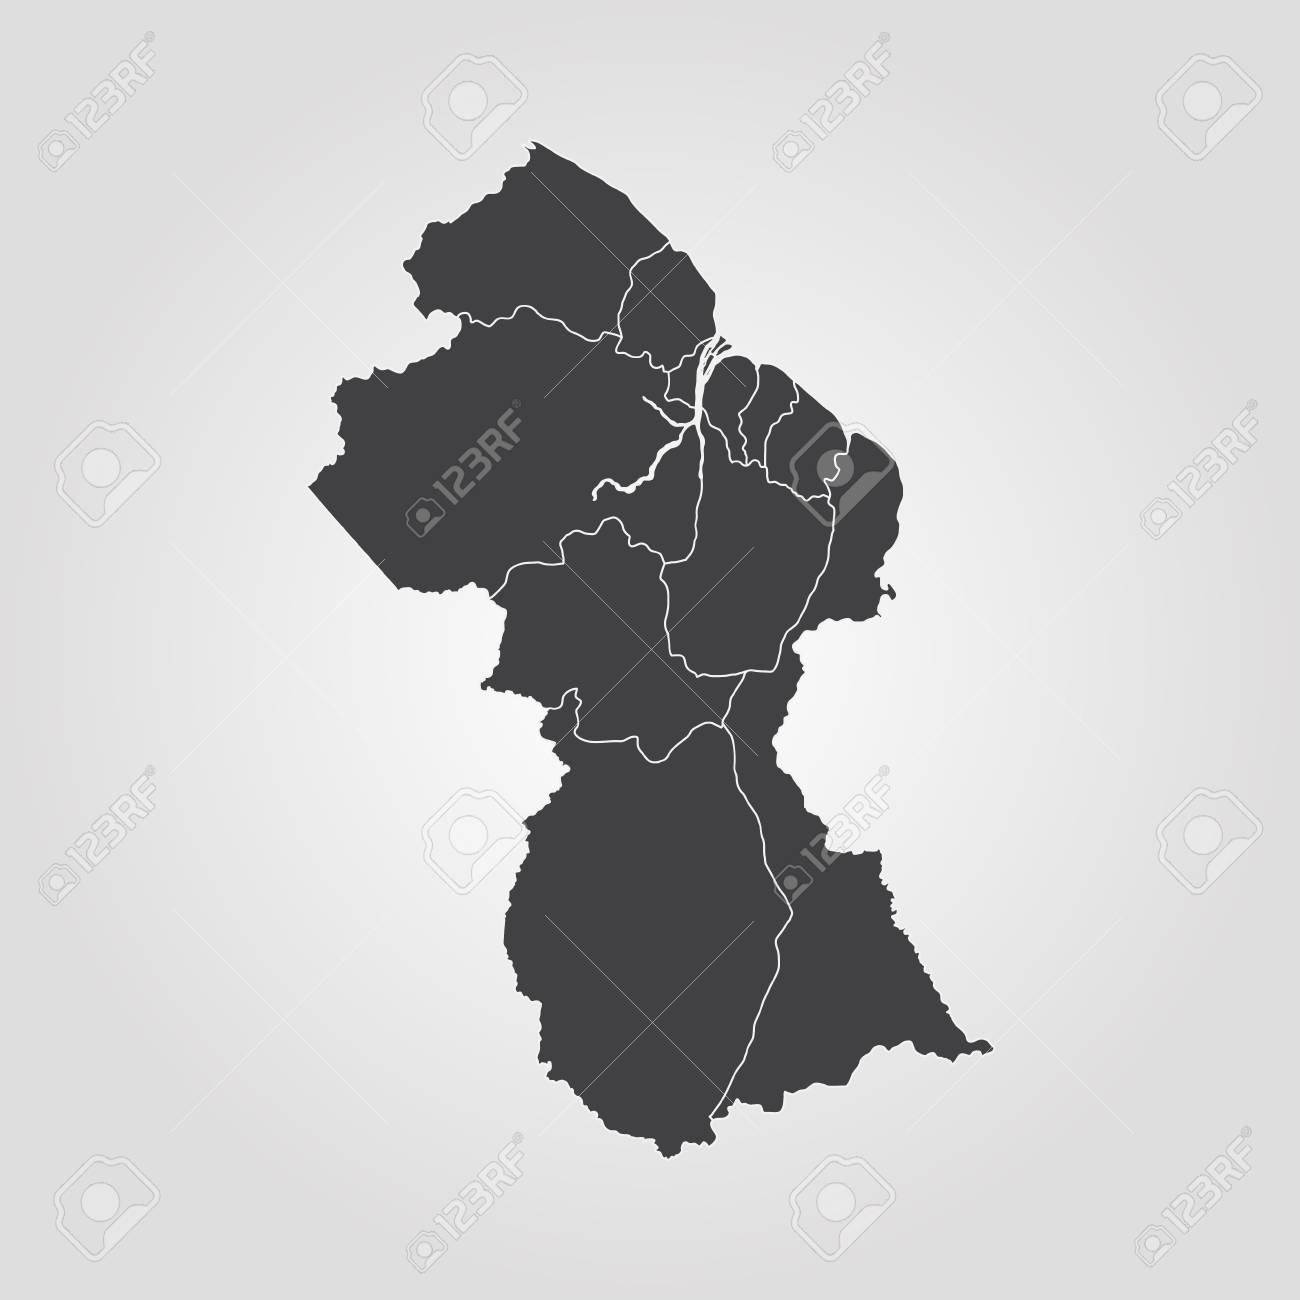 Map Of Guyana Vector Illustration World Map Royalty Free Cliparts